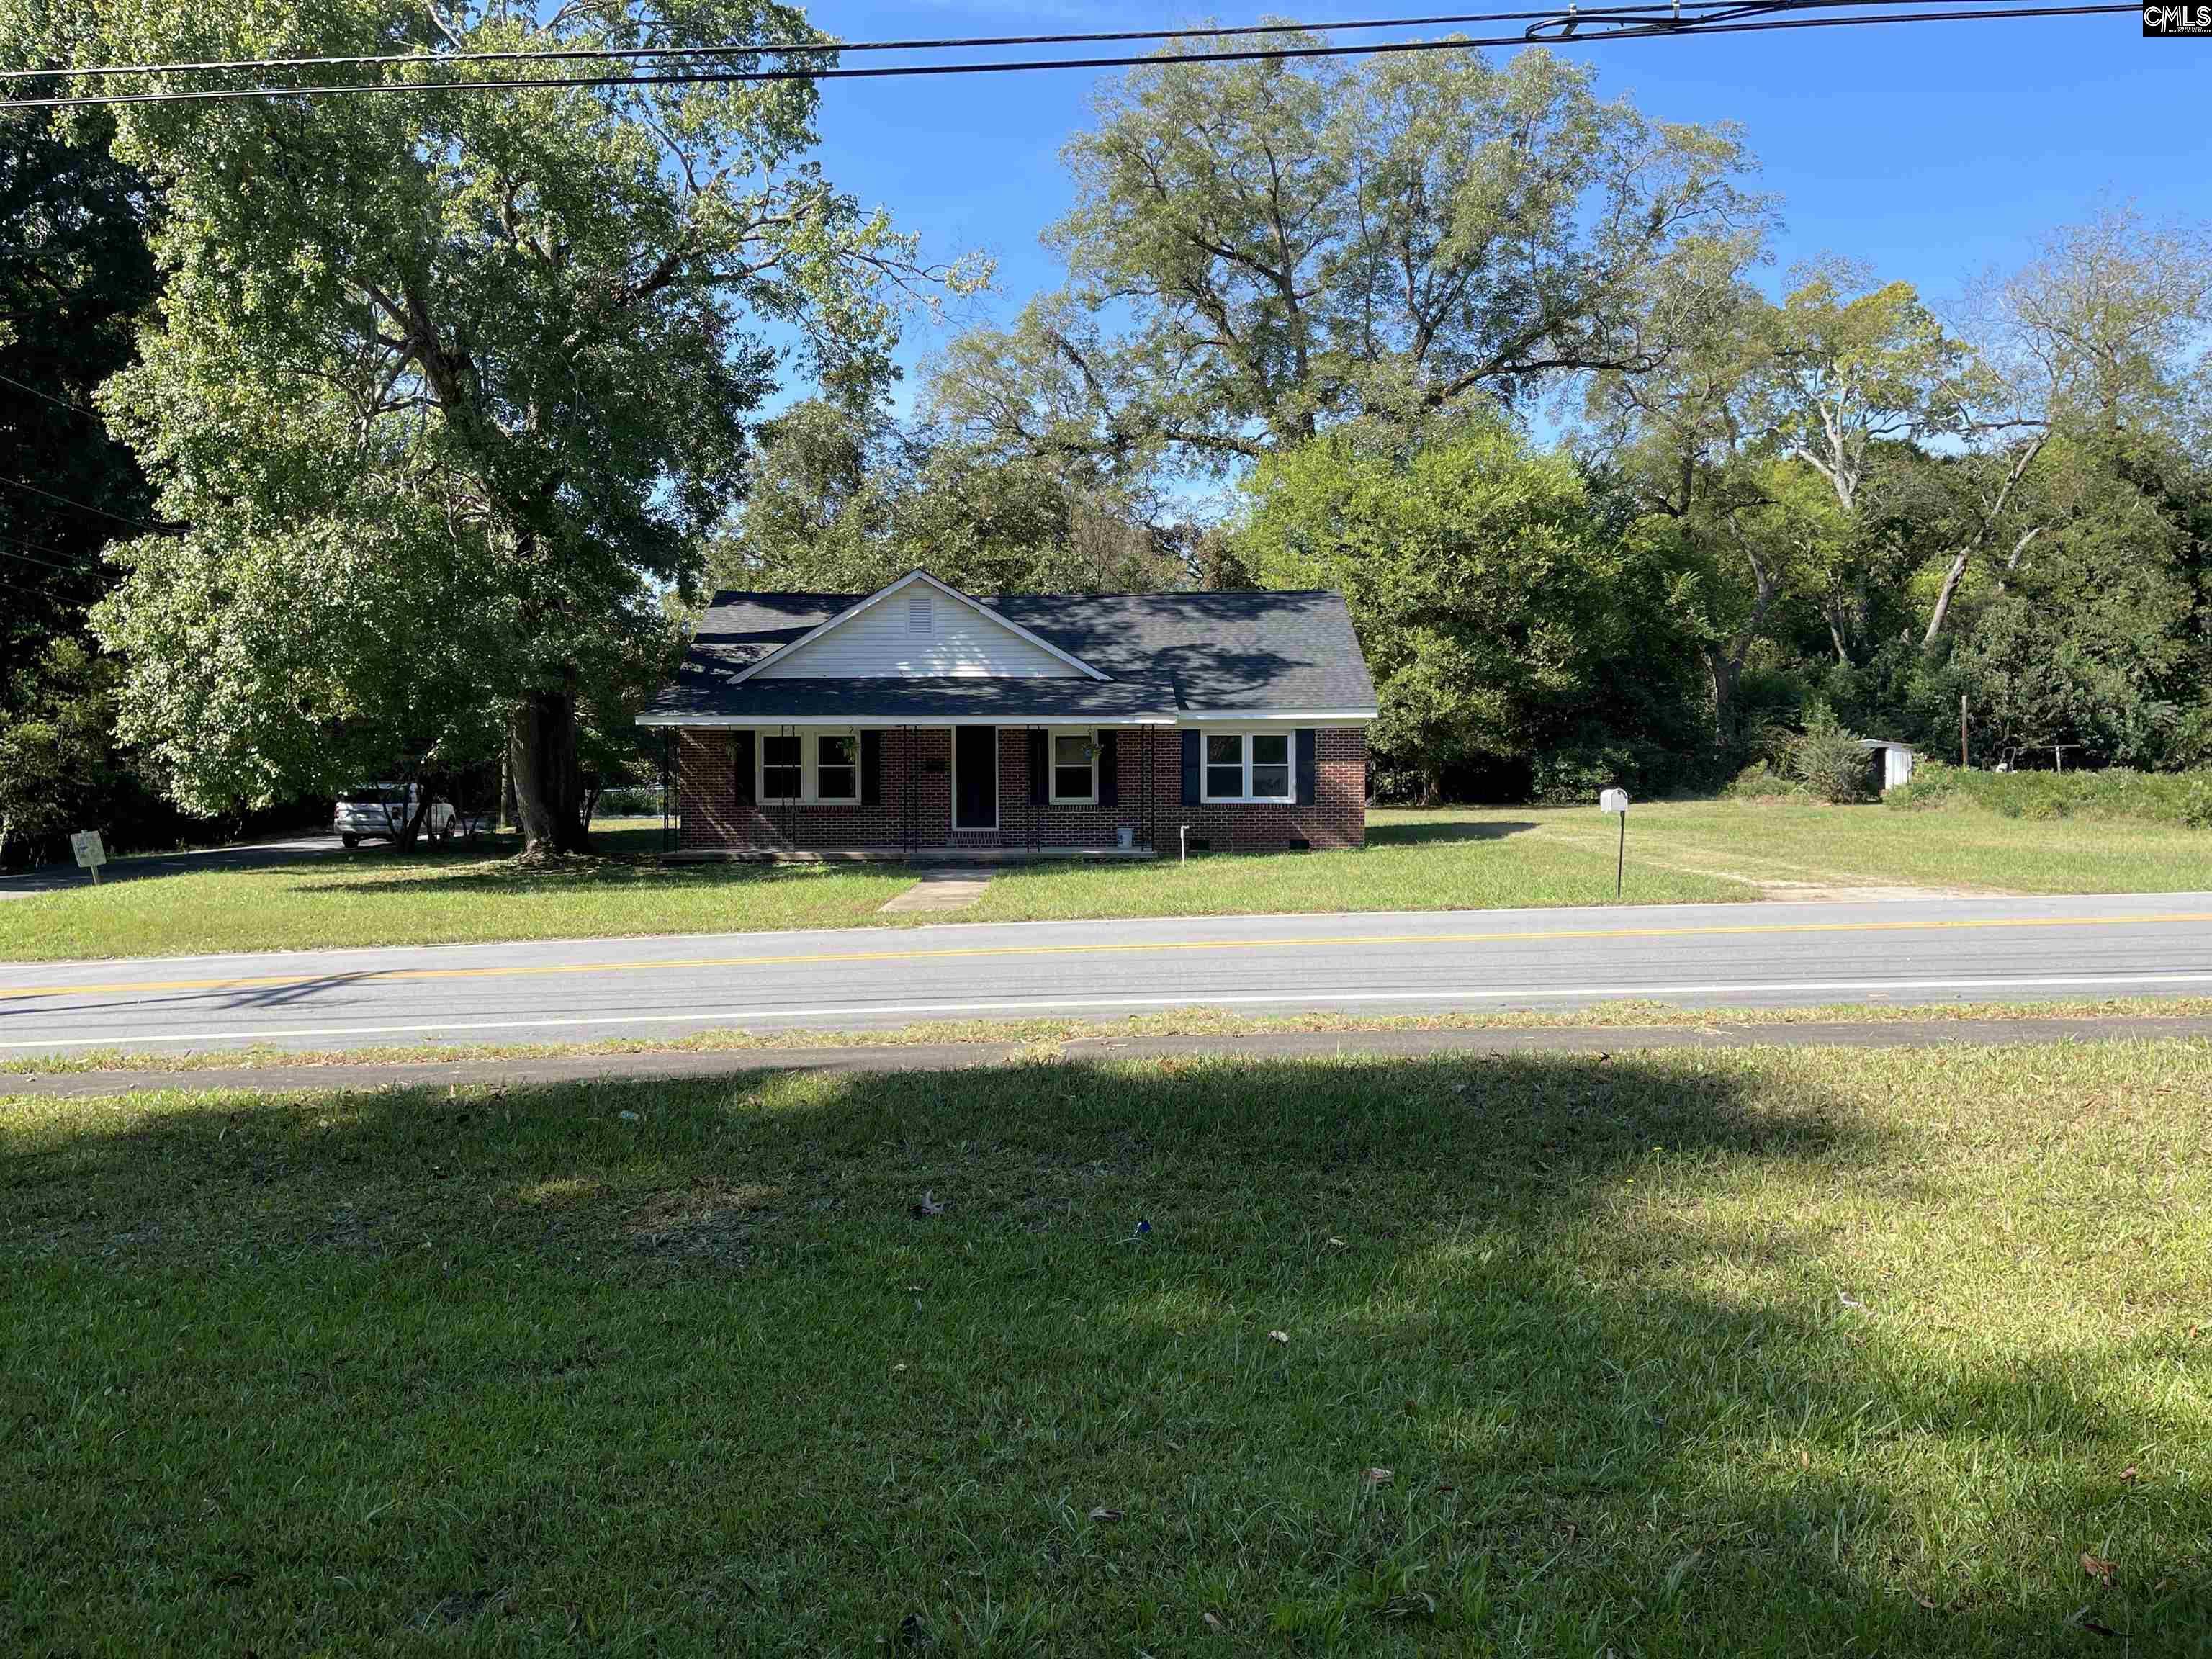 500 N North Zion Winnsboro, SC 29180